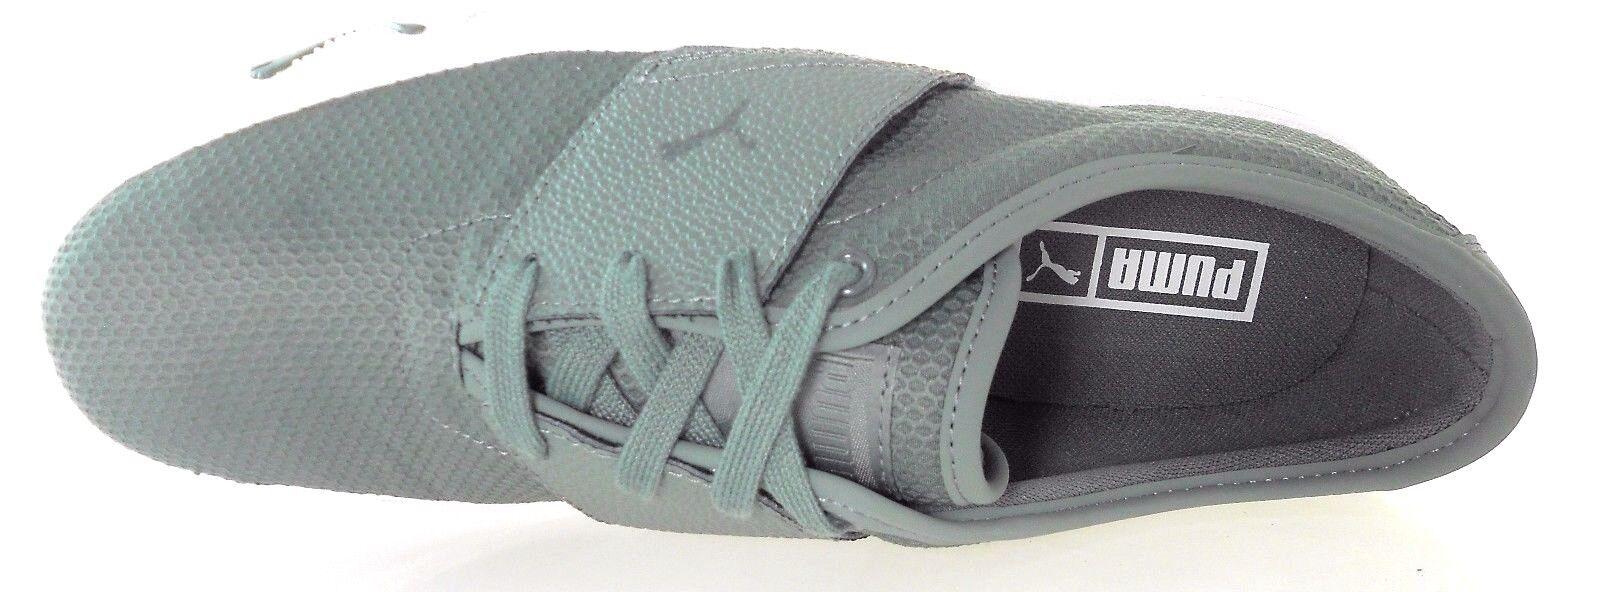 PUMA EL ACE GREEN TEXTUROT MEN'S AGAVE GREEN ACE Schuhe #36166504 6b1257